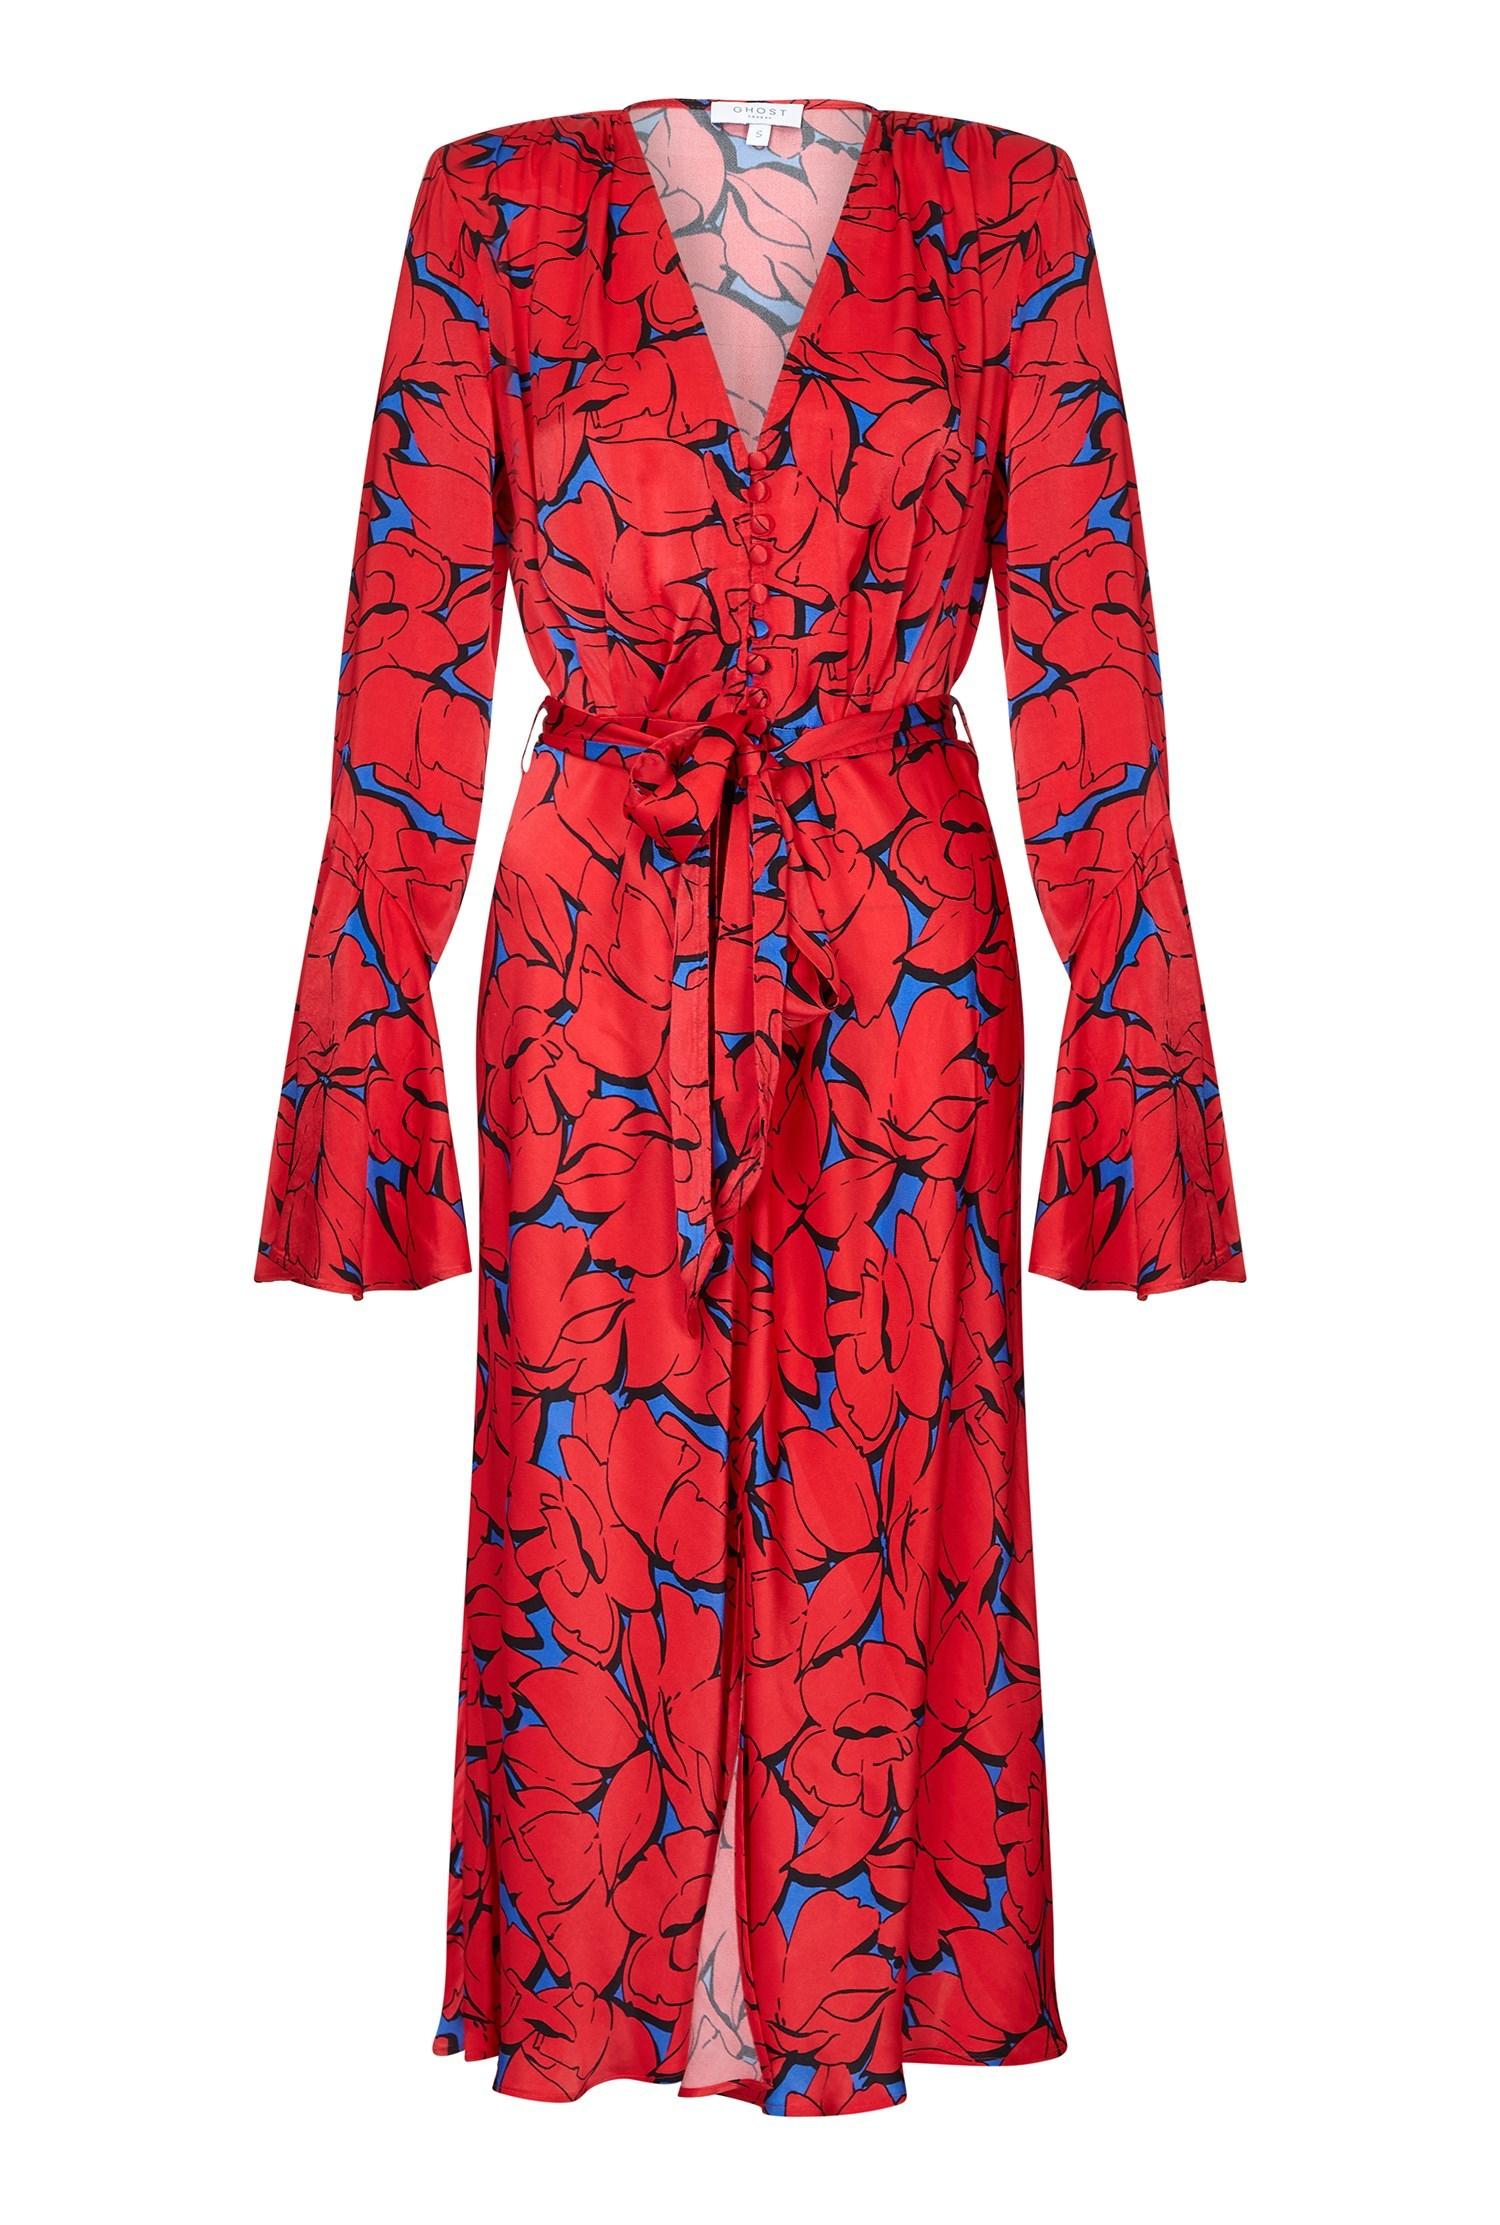 GHOST Annabelle Dress